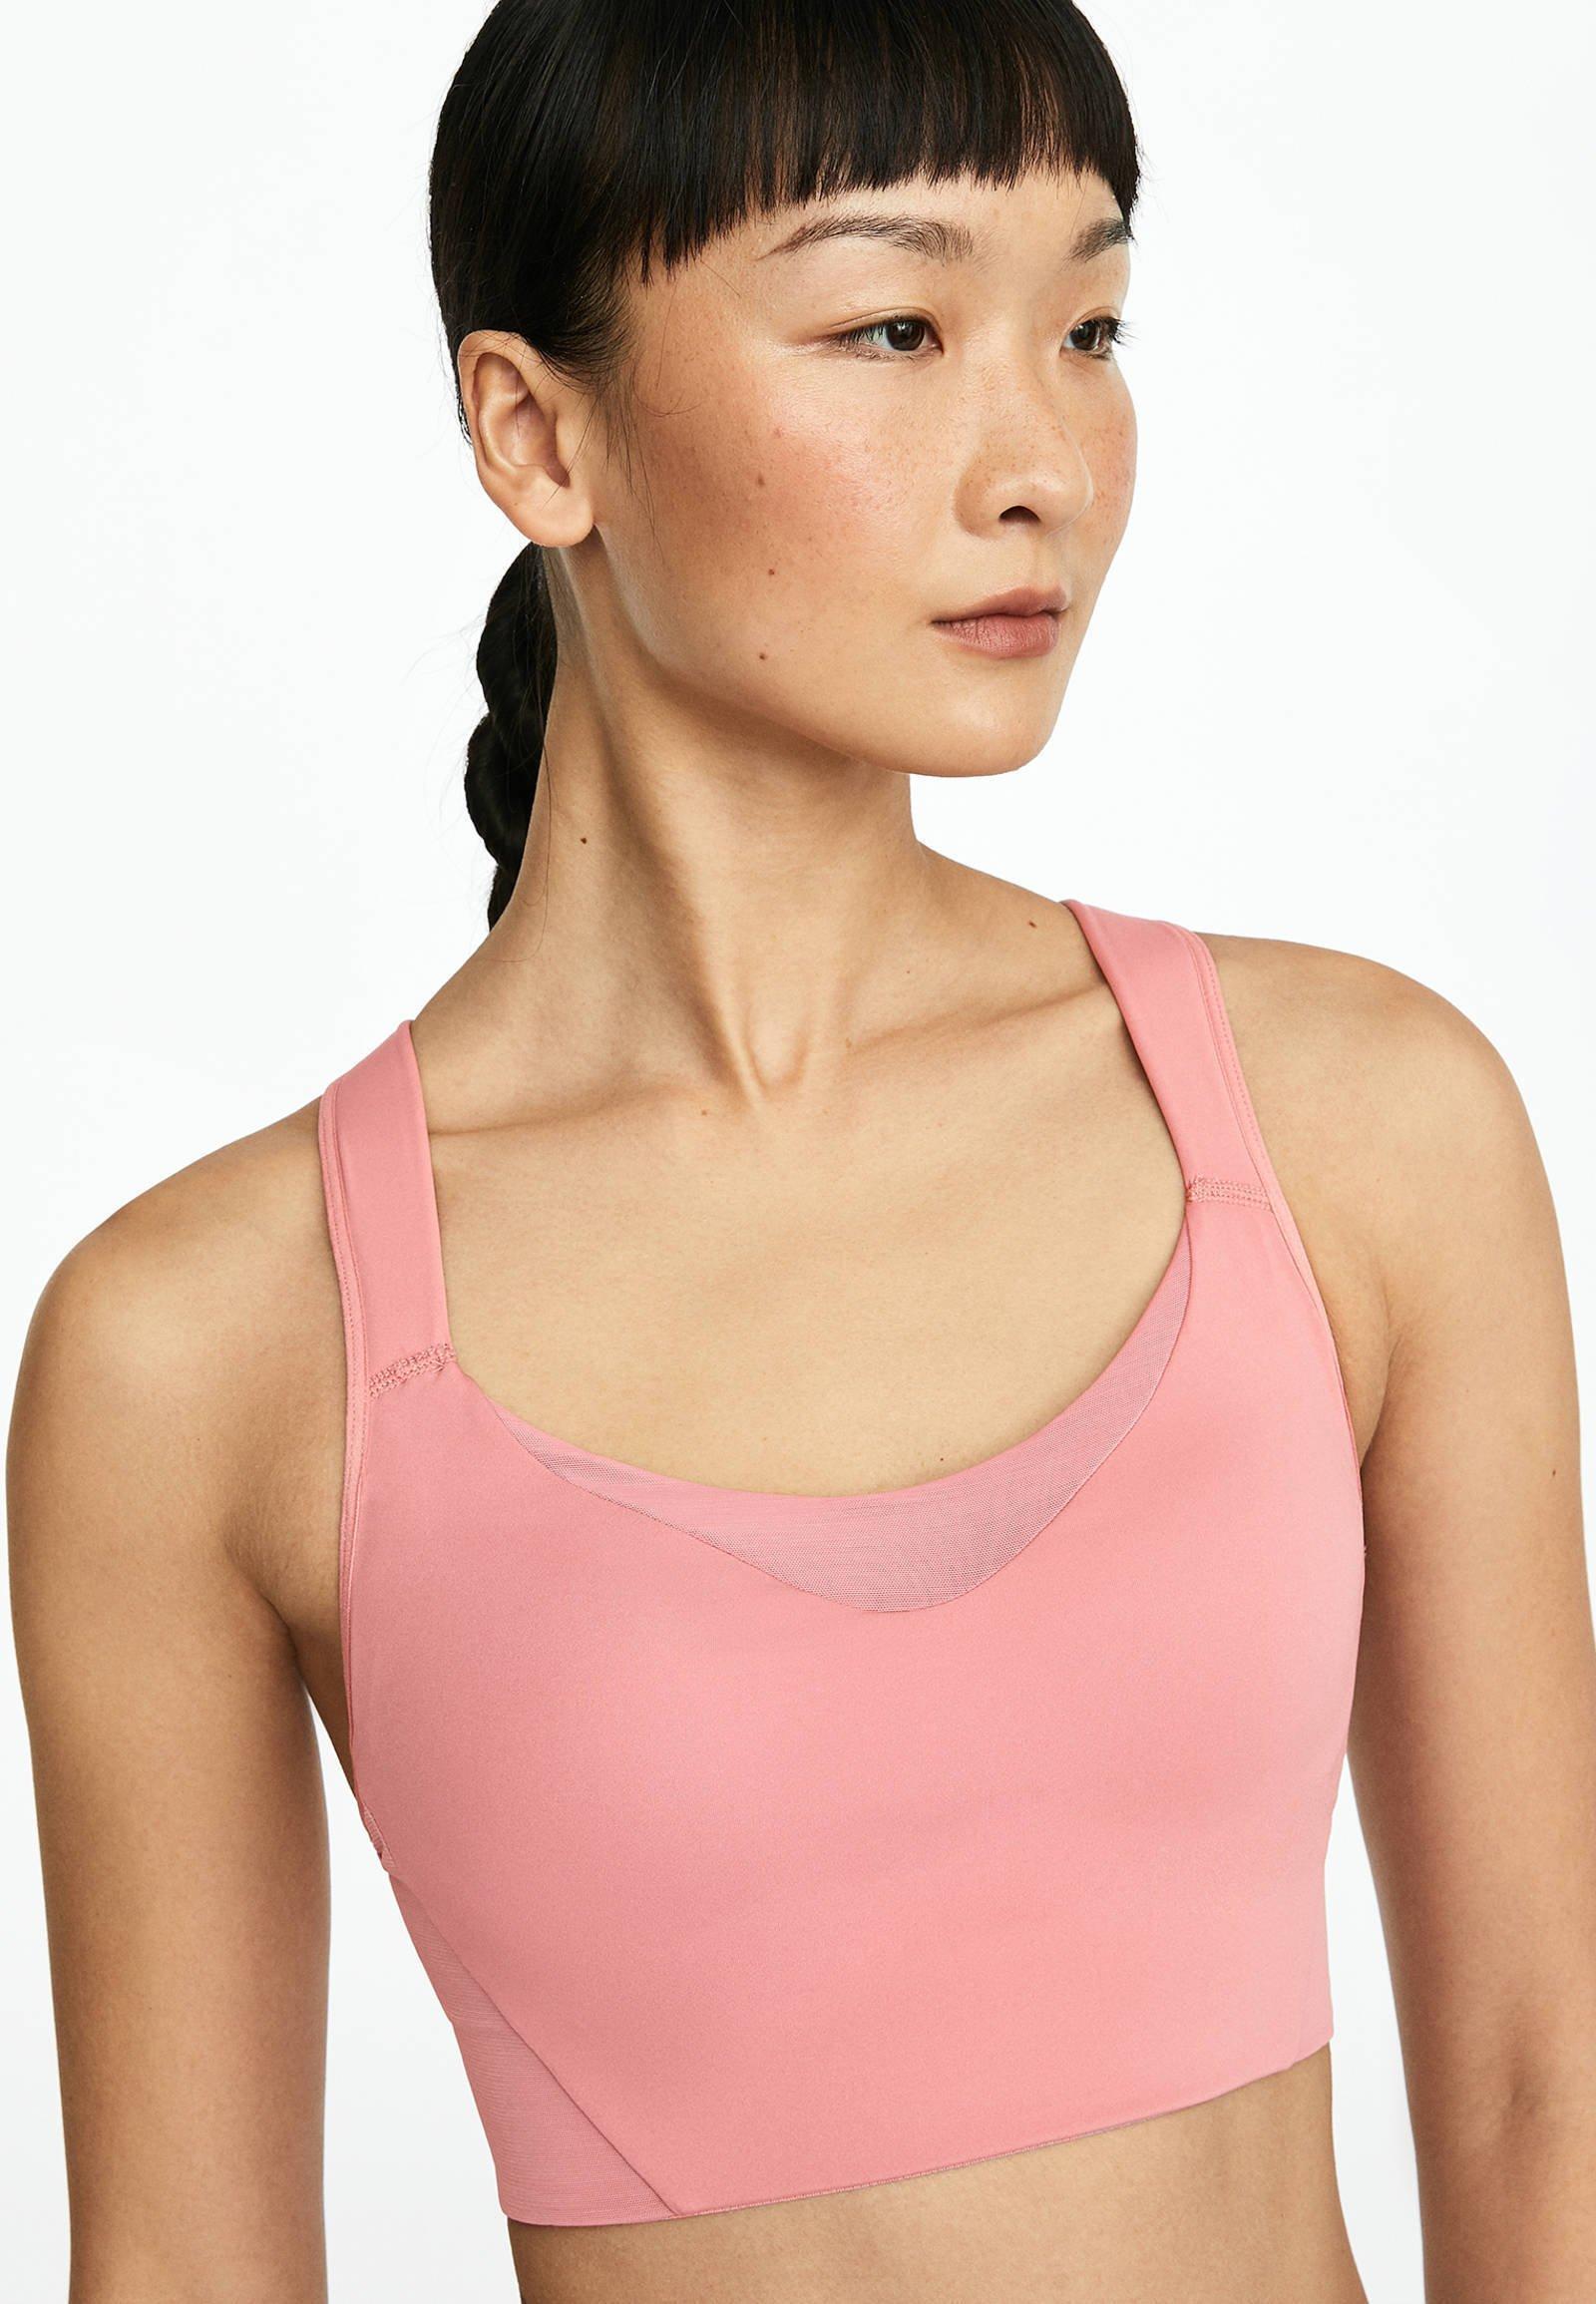 Betaalbaar Best Verkopende Dameskleding sdkjGX55lghisd OYSHO_SPORT MIT DETAILS  Sport BH pink DBCRlZ0